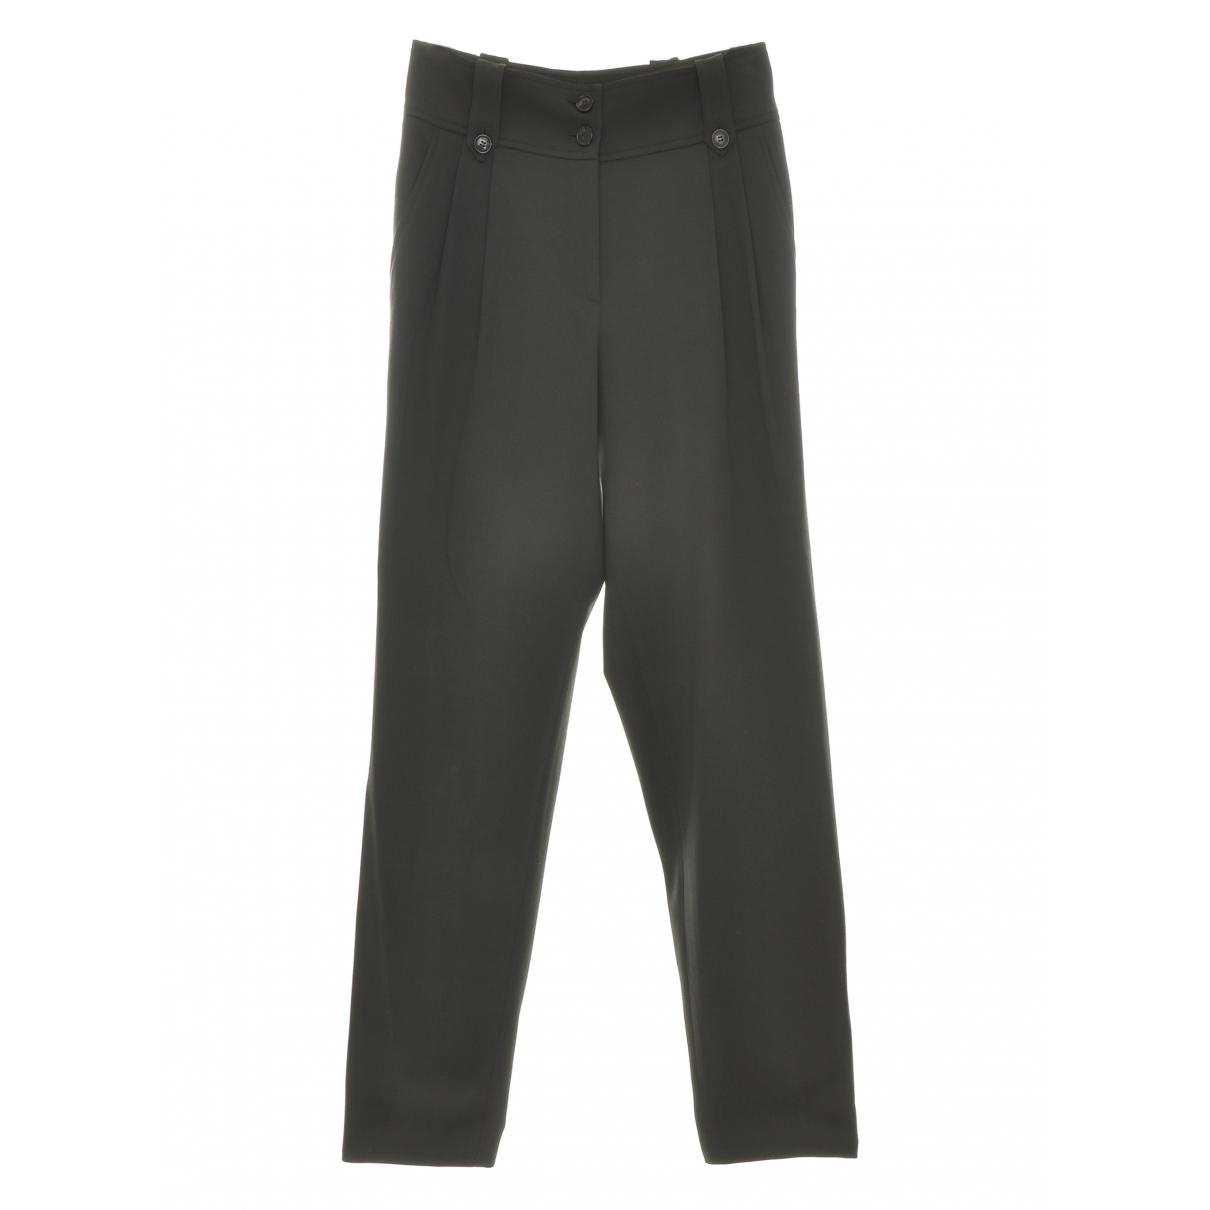 Dior \N Khaki Wool Trousers for Women 40 IT